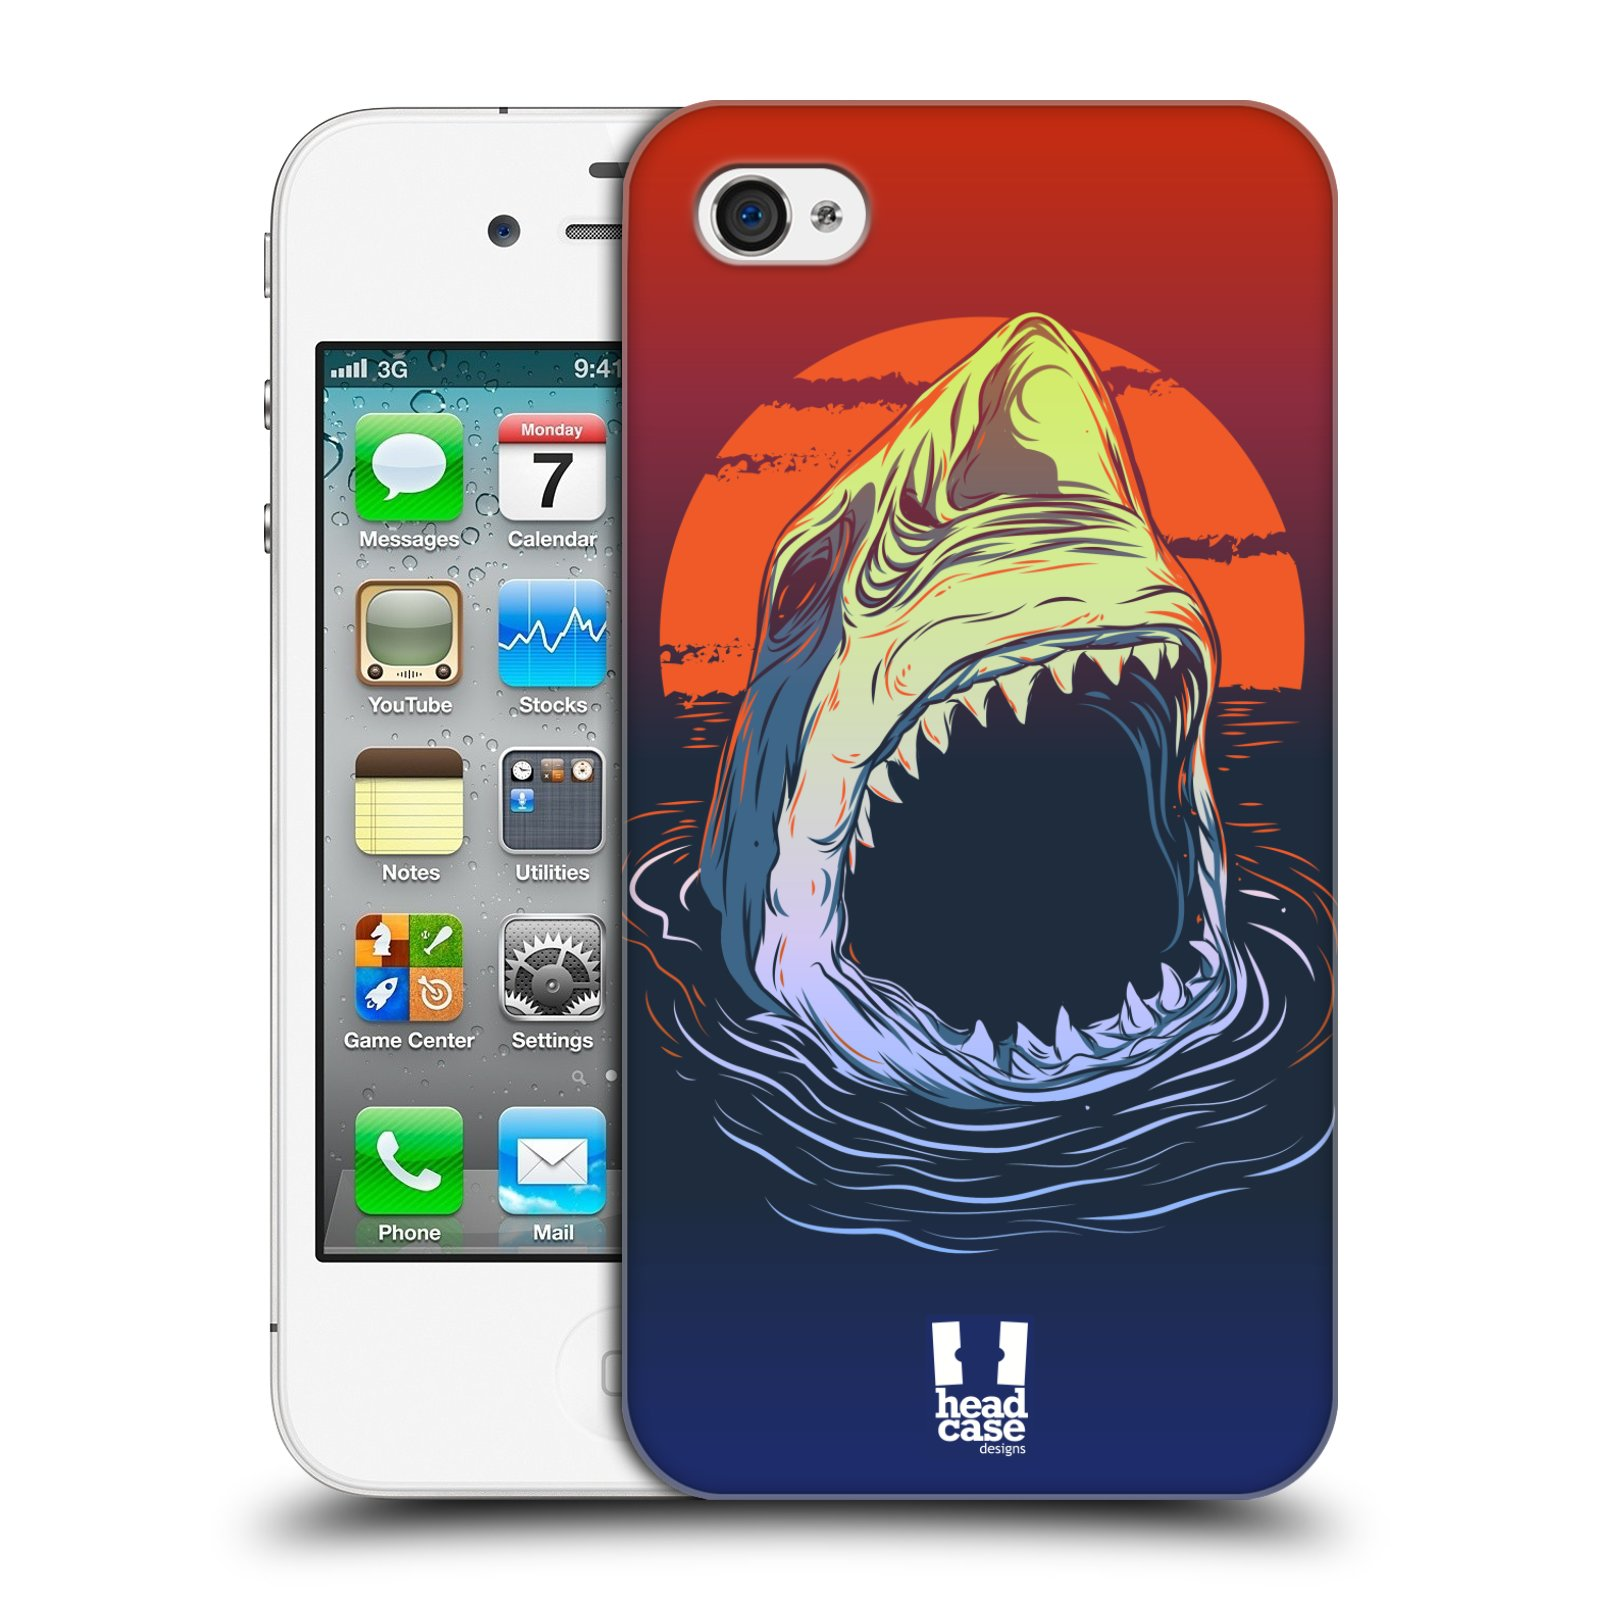 HEAD CASE plastový obal na mobil Apple Iphone 4/4S vzor mořská monstra žralok